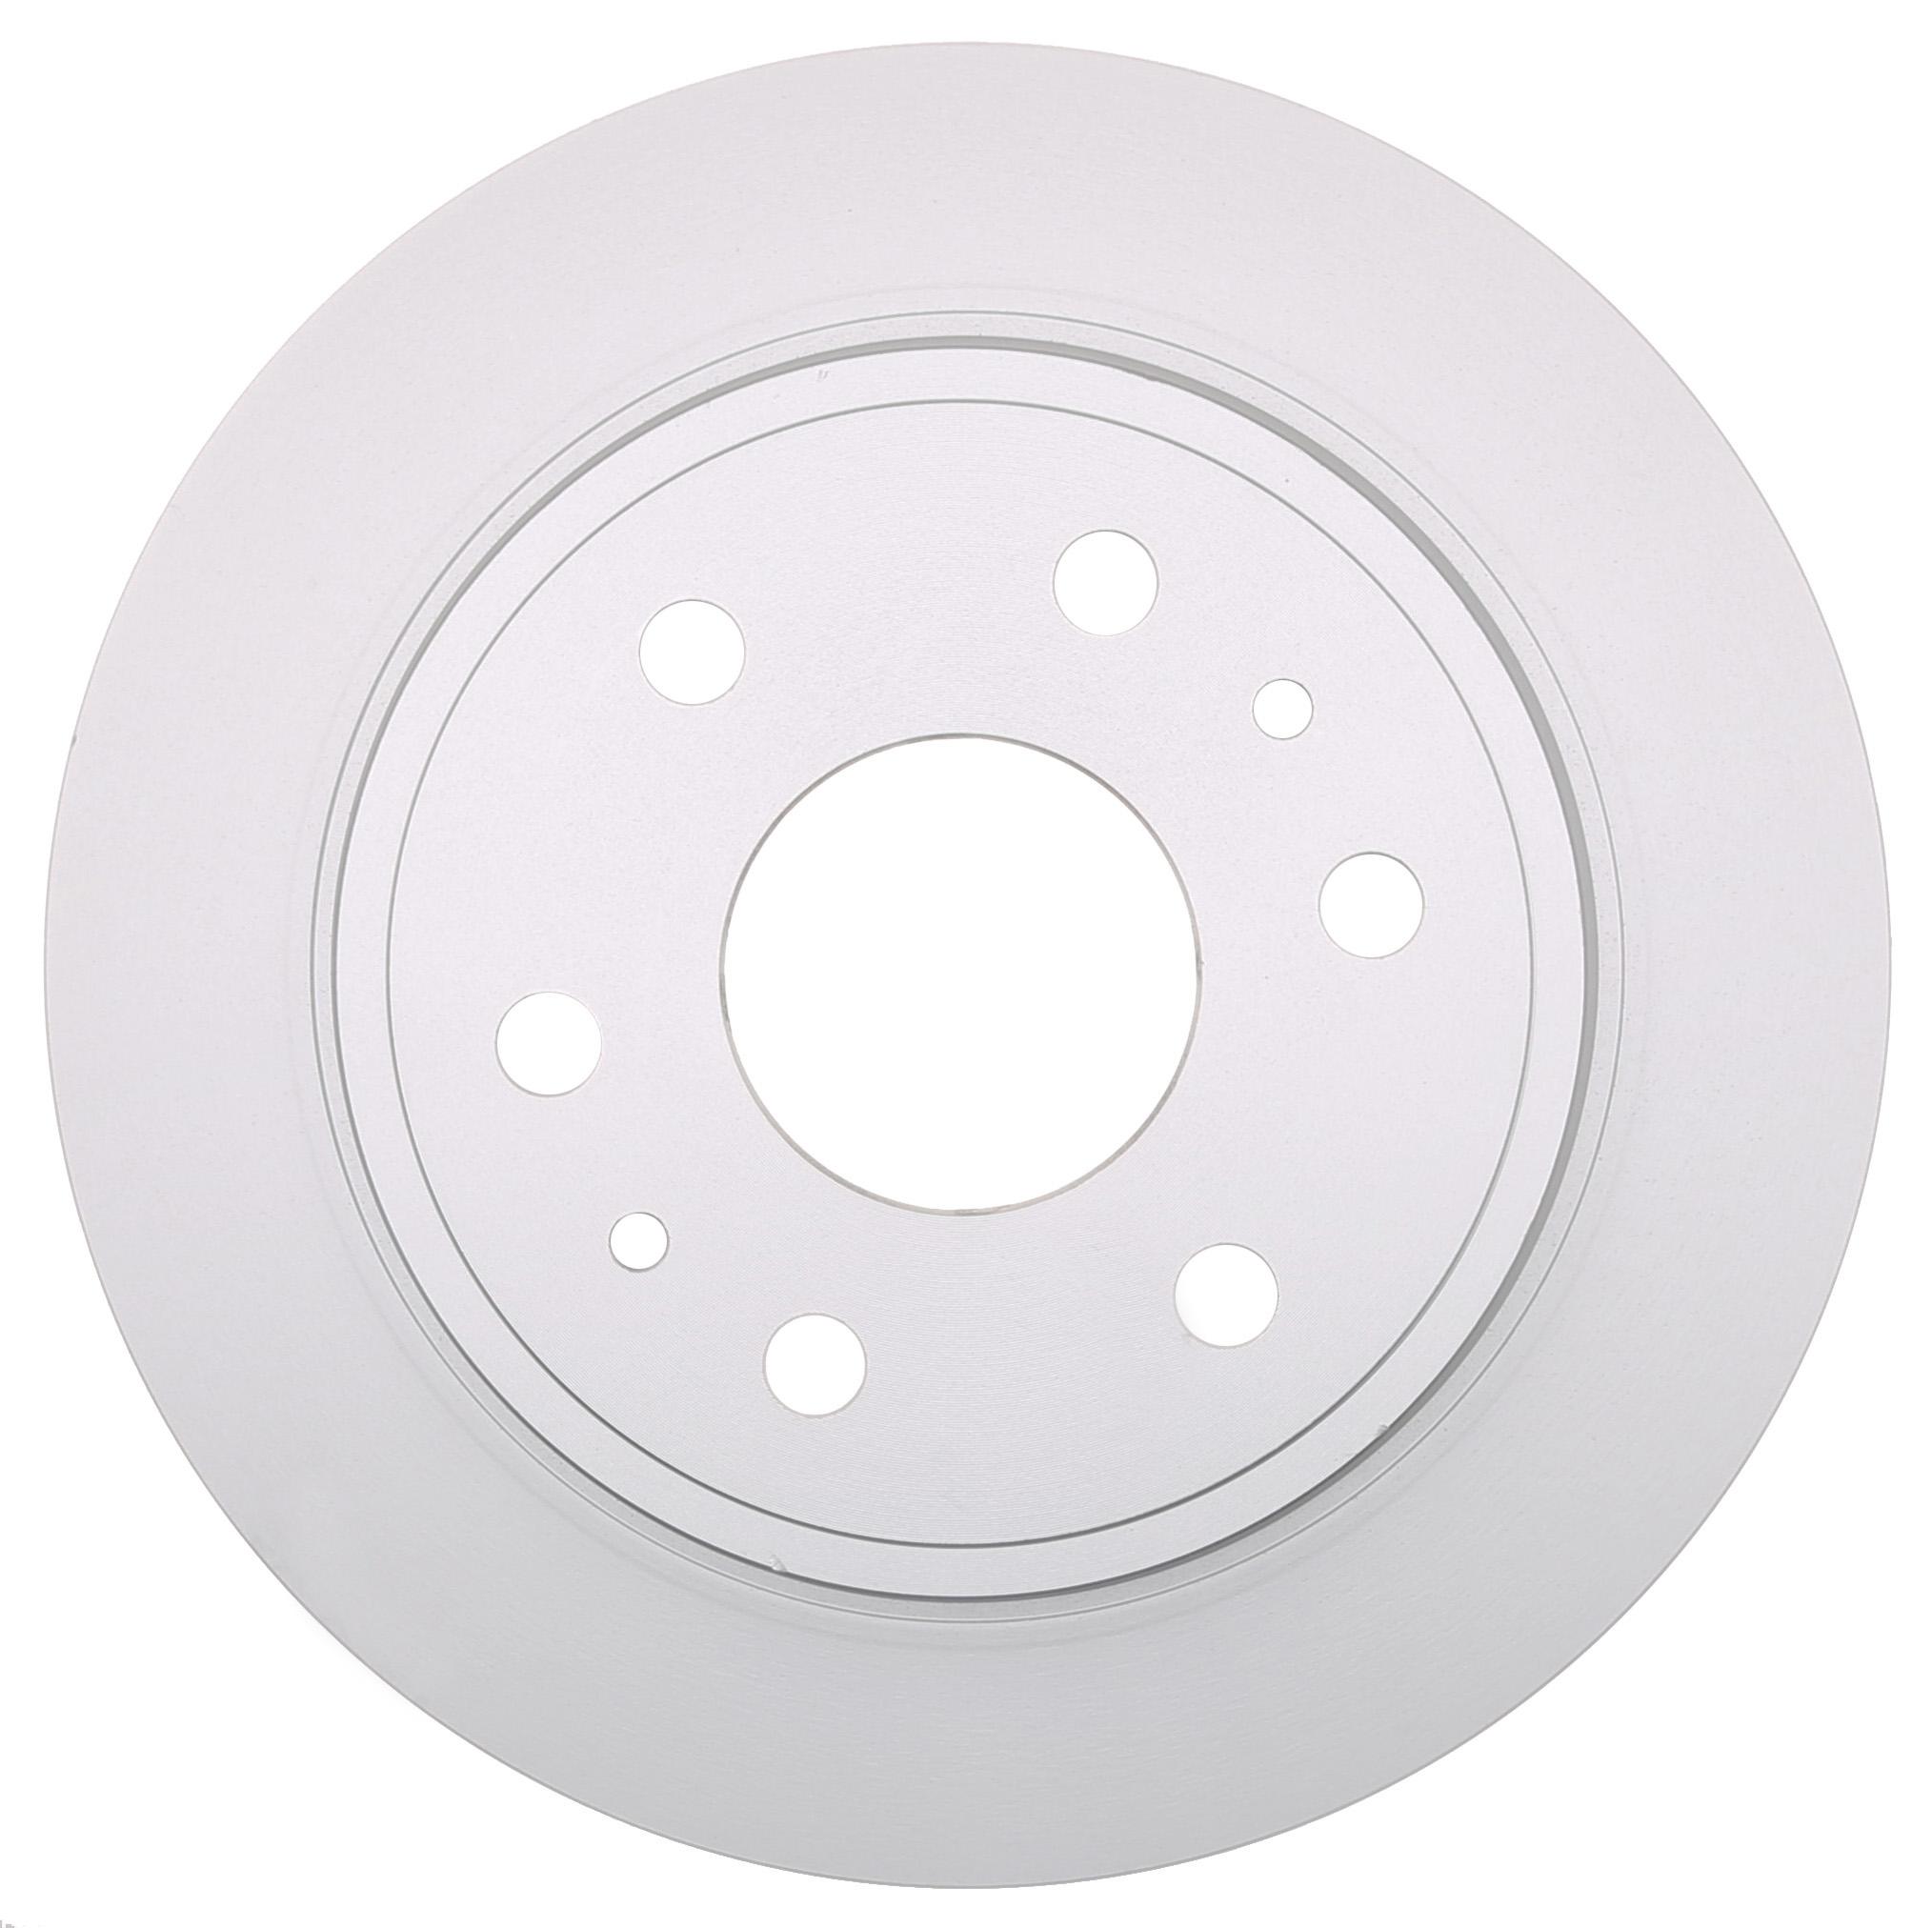 ACDELCO PROFESSIONAL BRAKES - Disc Brake Rotor - ADU 18A81032